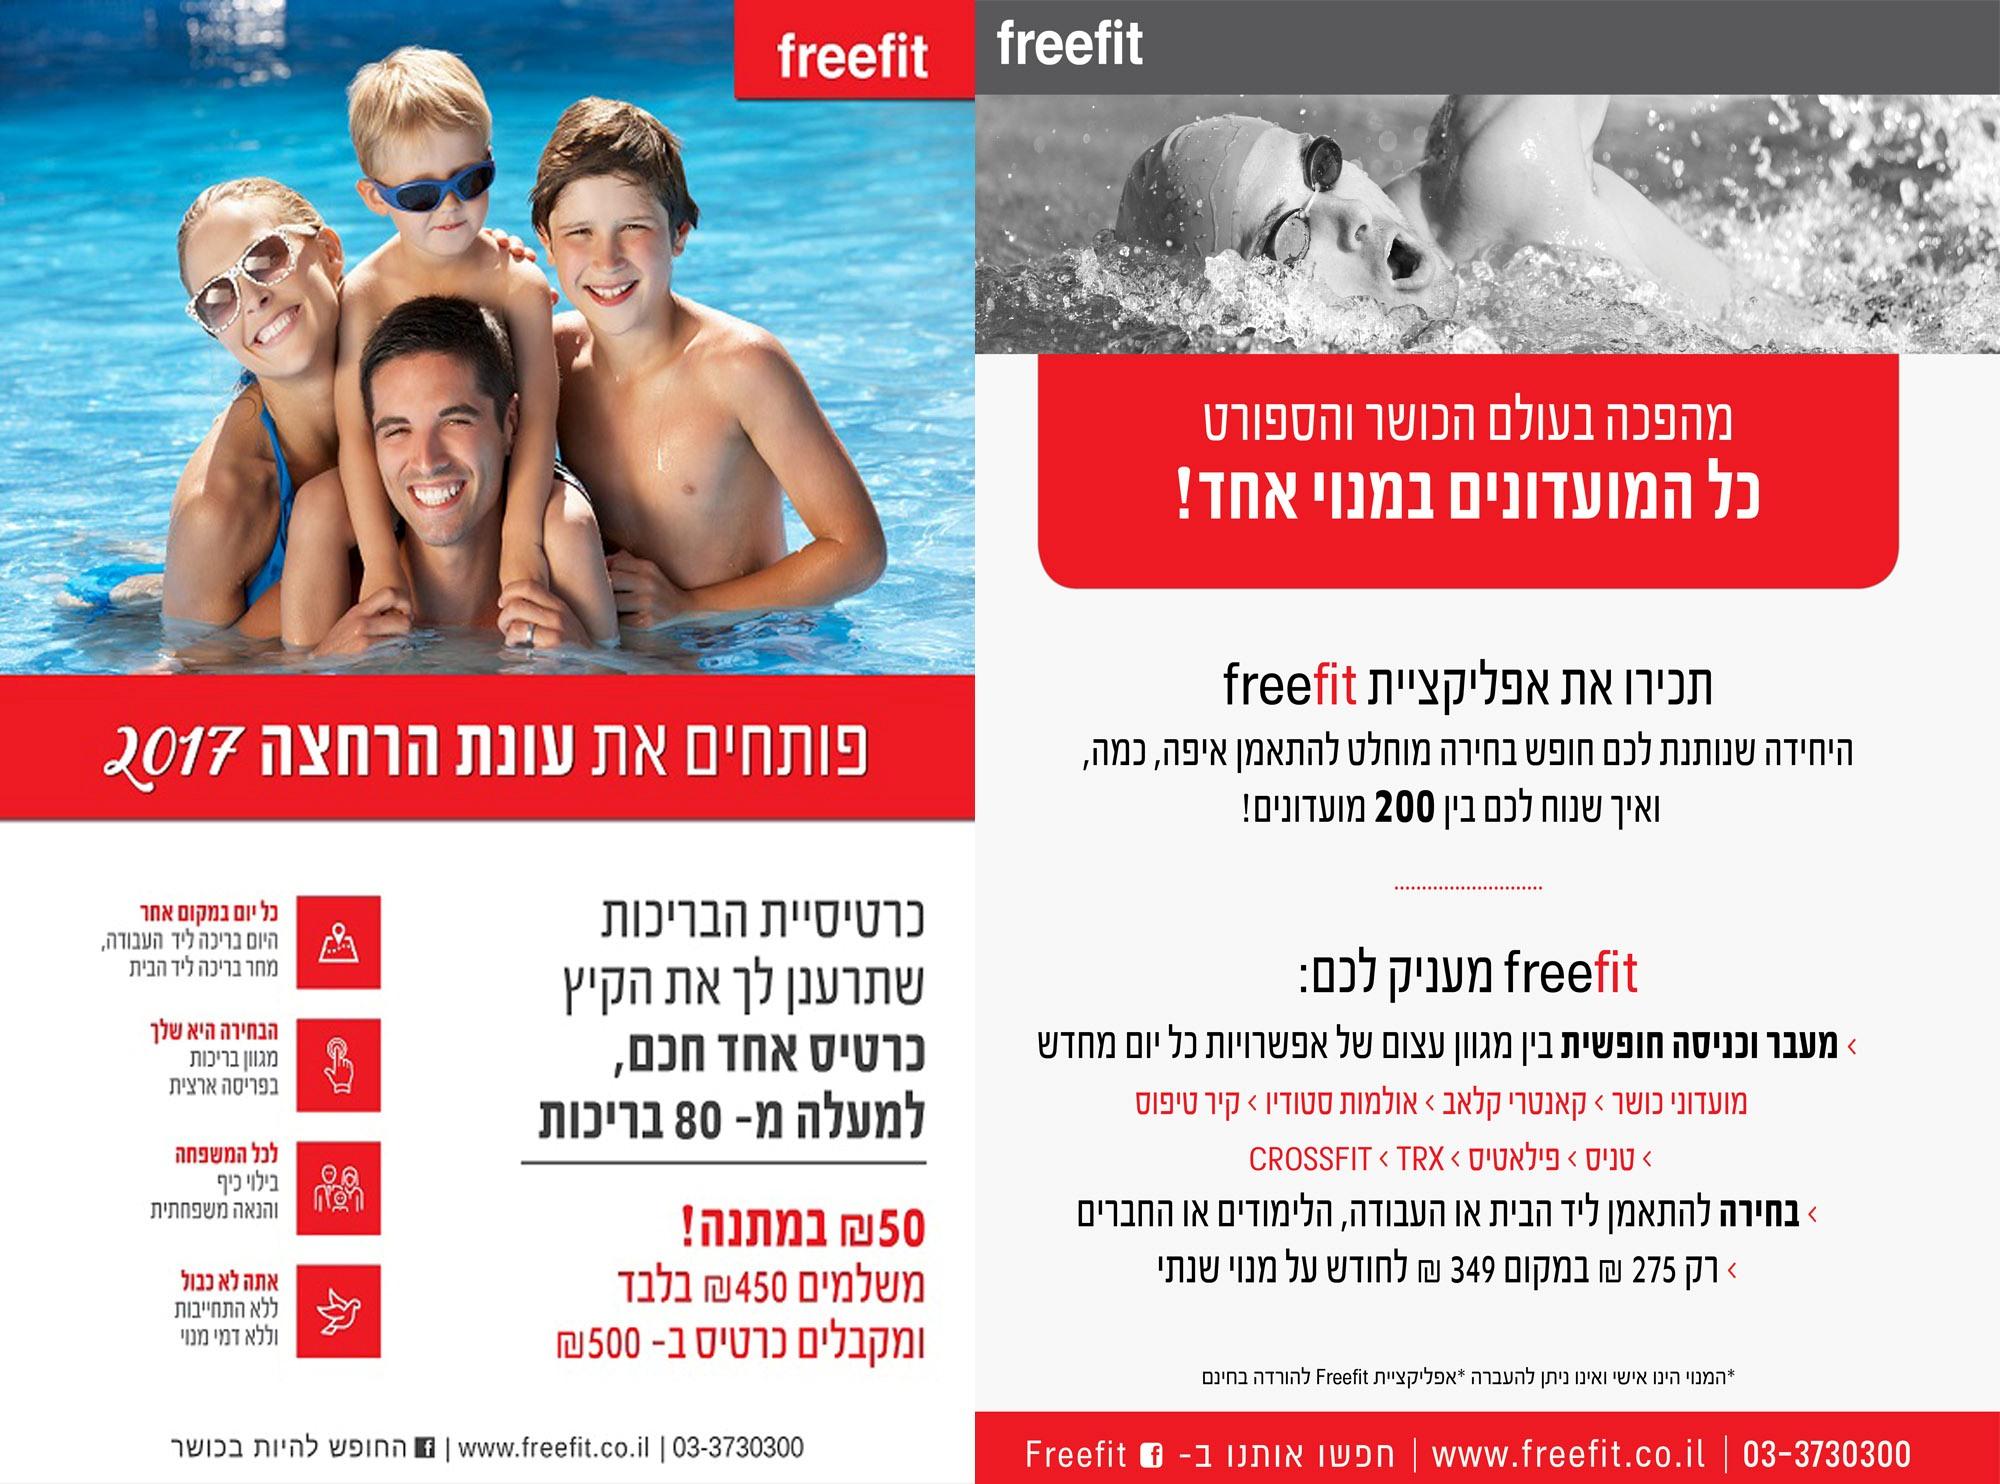 freefit